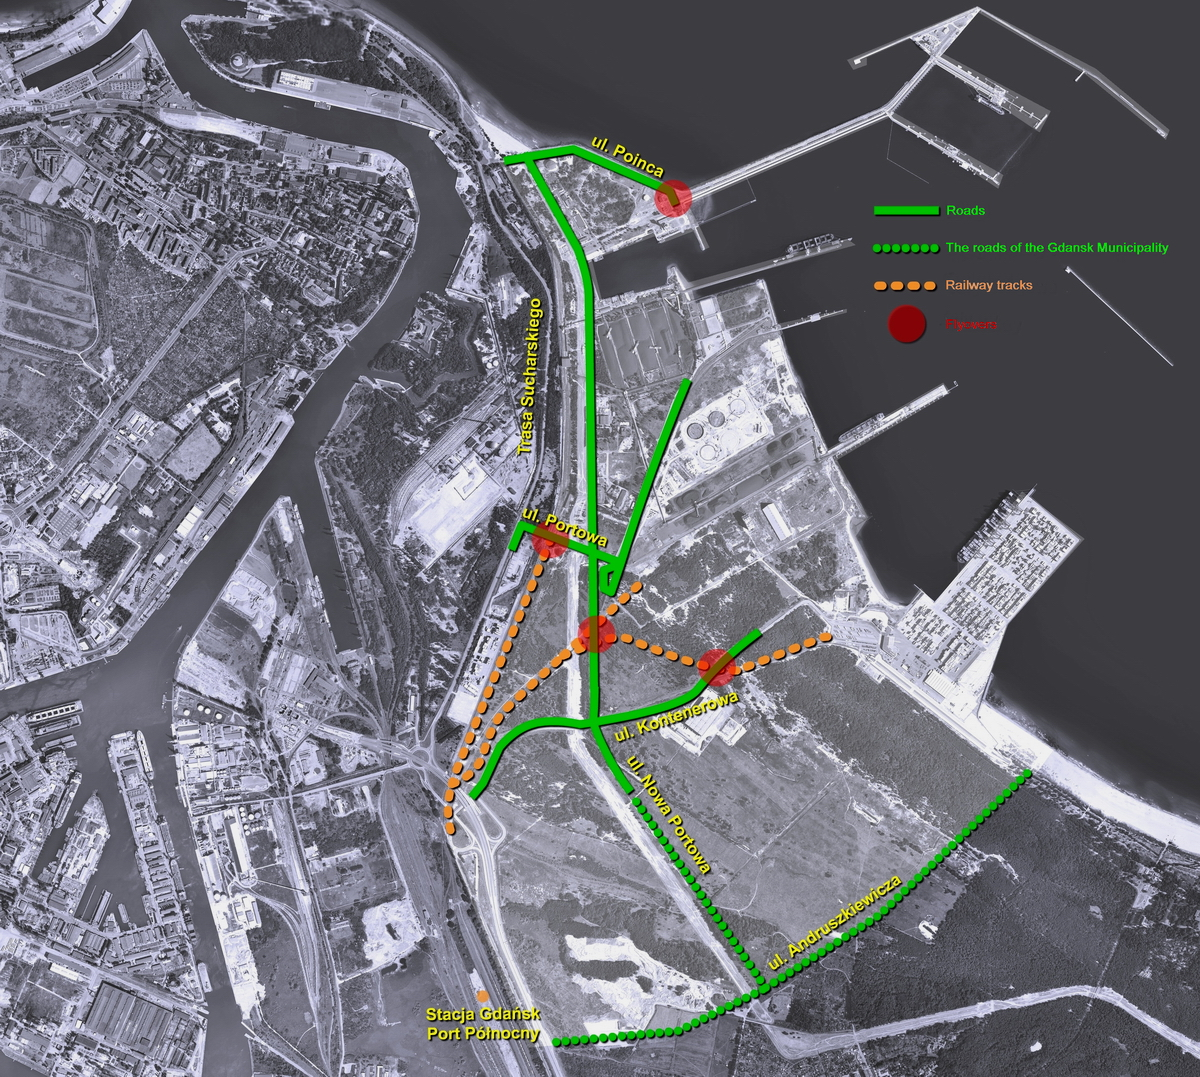 Port of Gdansk signed agreements for EU grants to finance huge investments